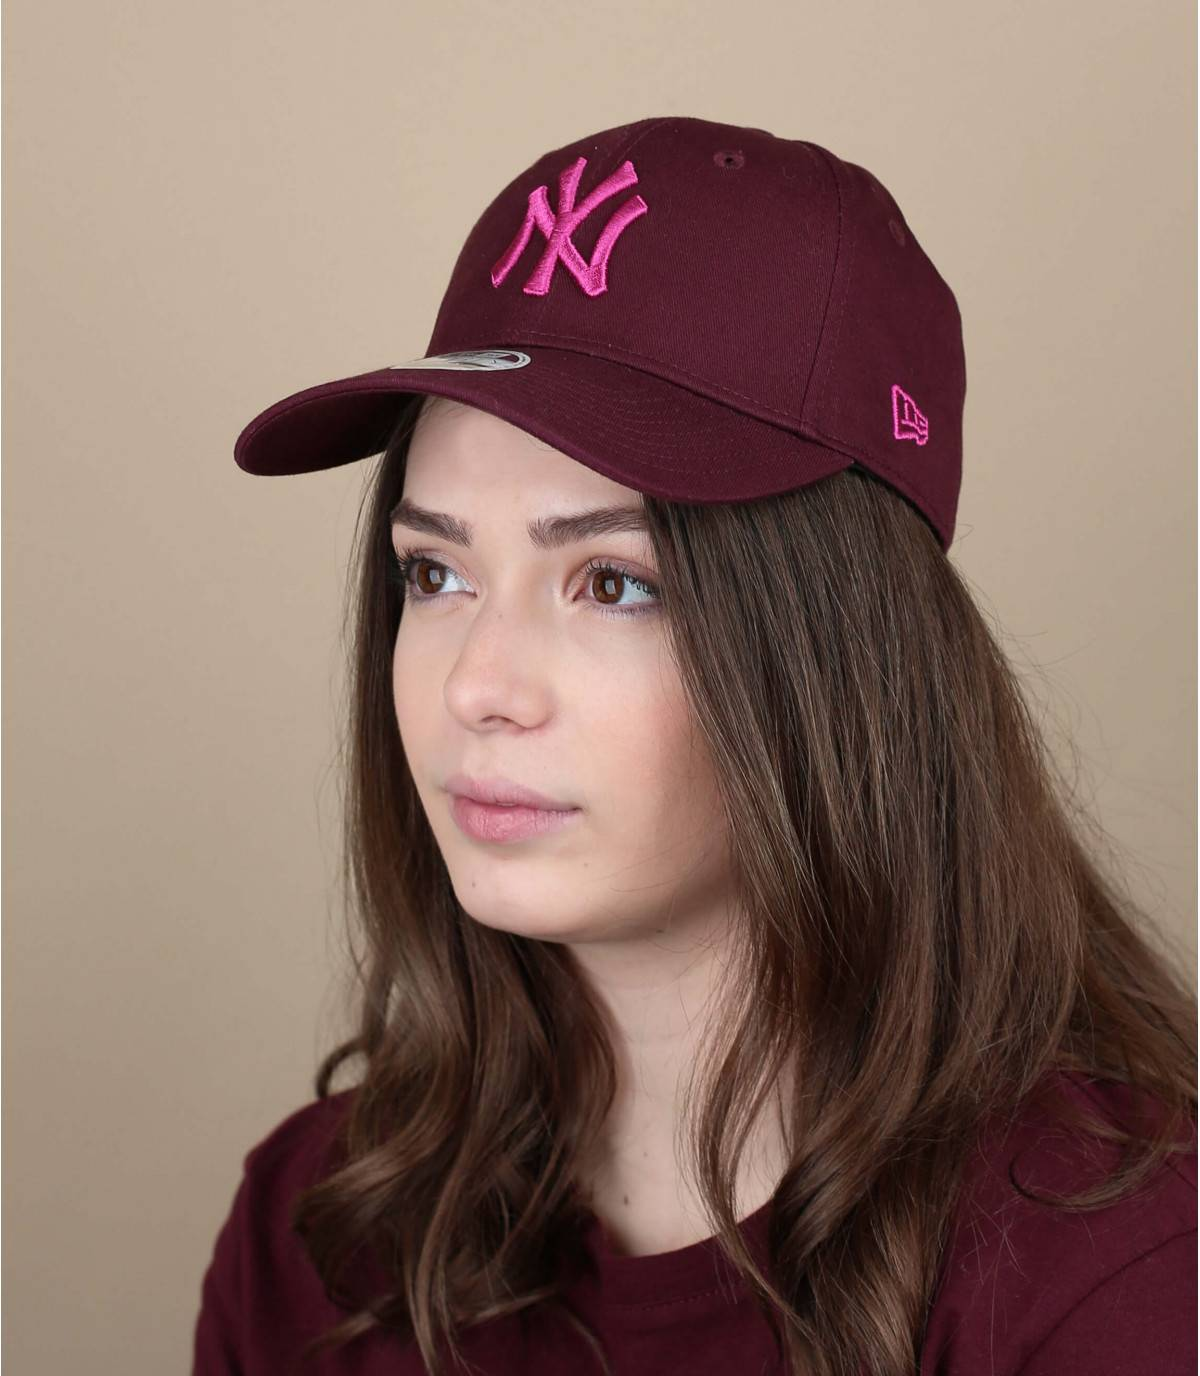 Damen Cap bordeaux